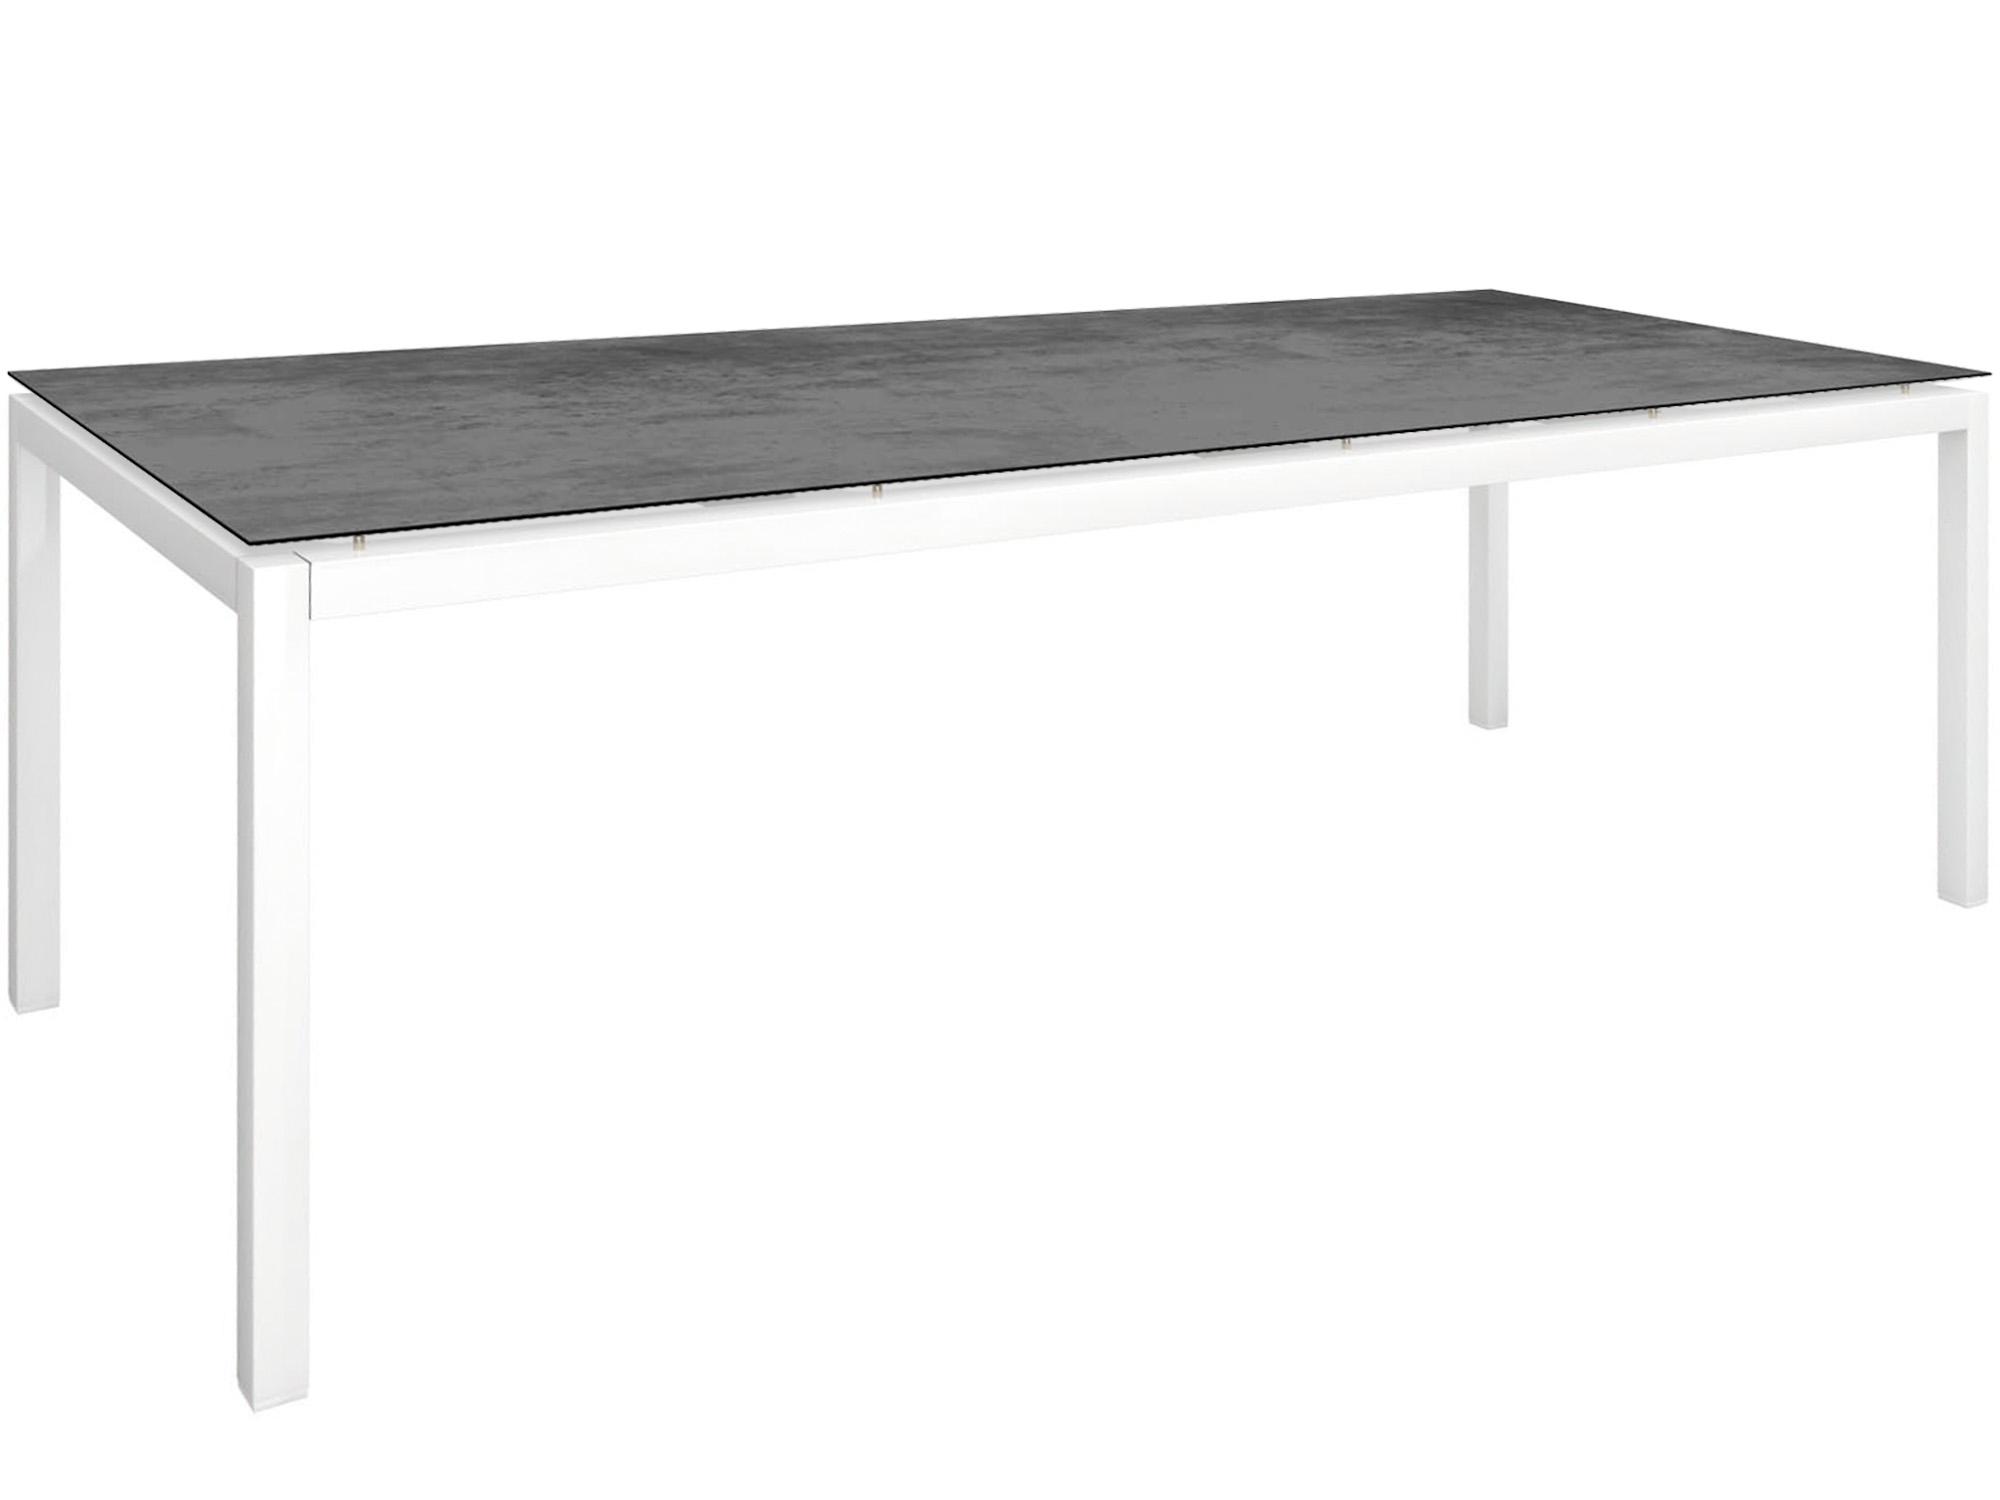 stern gartentisch 250x100cm aluminium wei silverstar 2 0 gartenm bel l nse. Black Bedroom Furniture Sets. Home Design Ideas